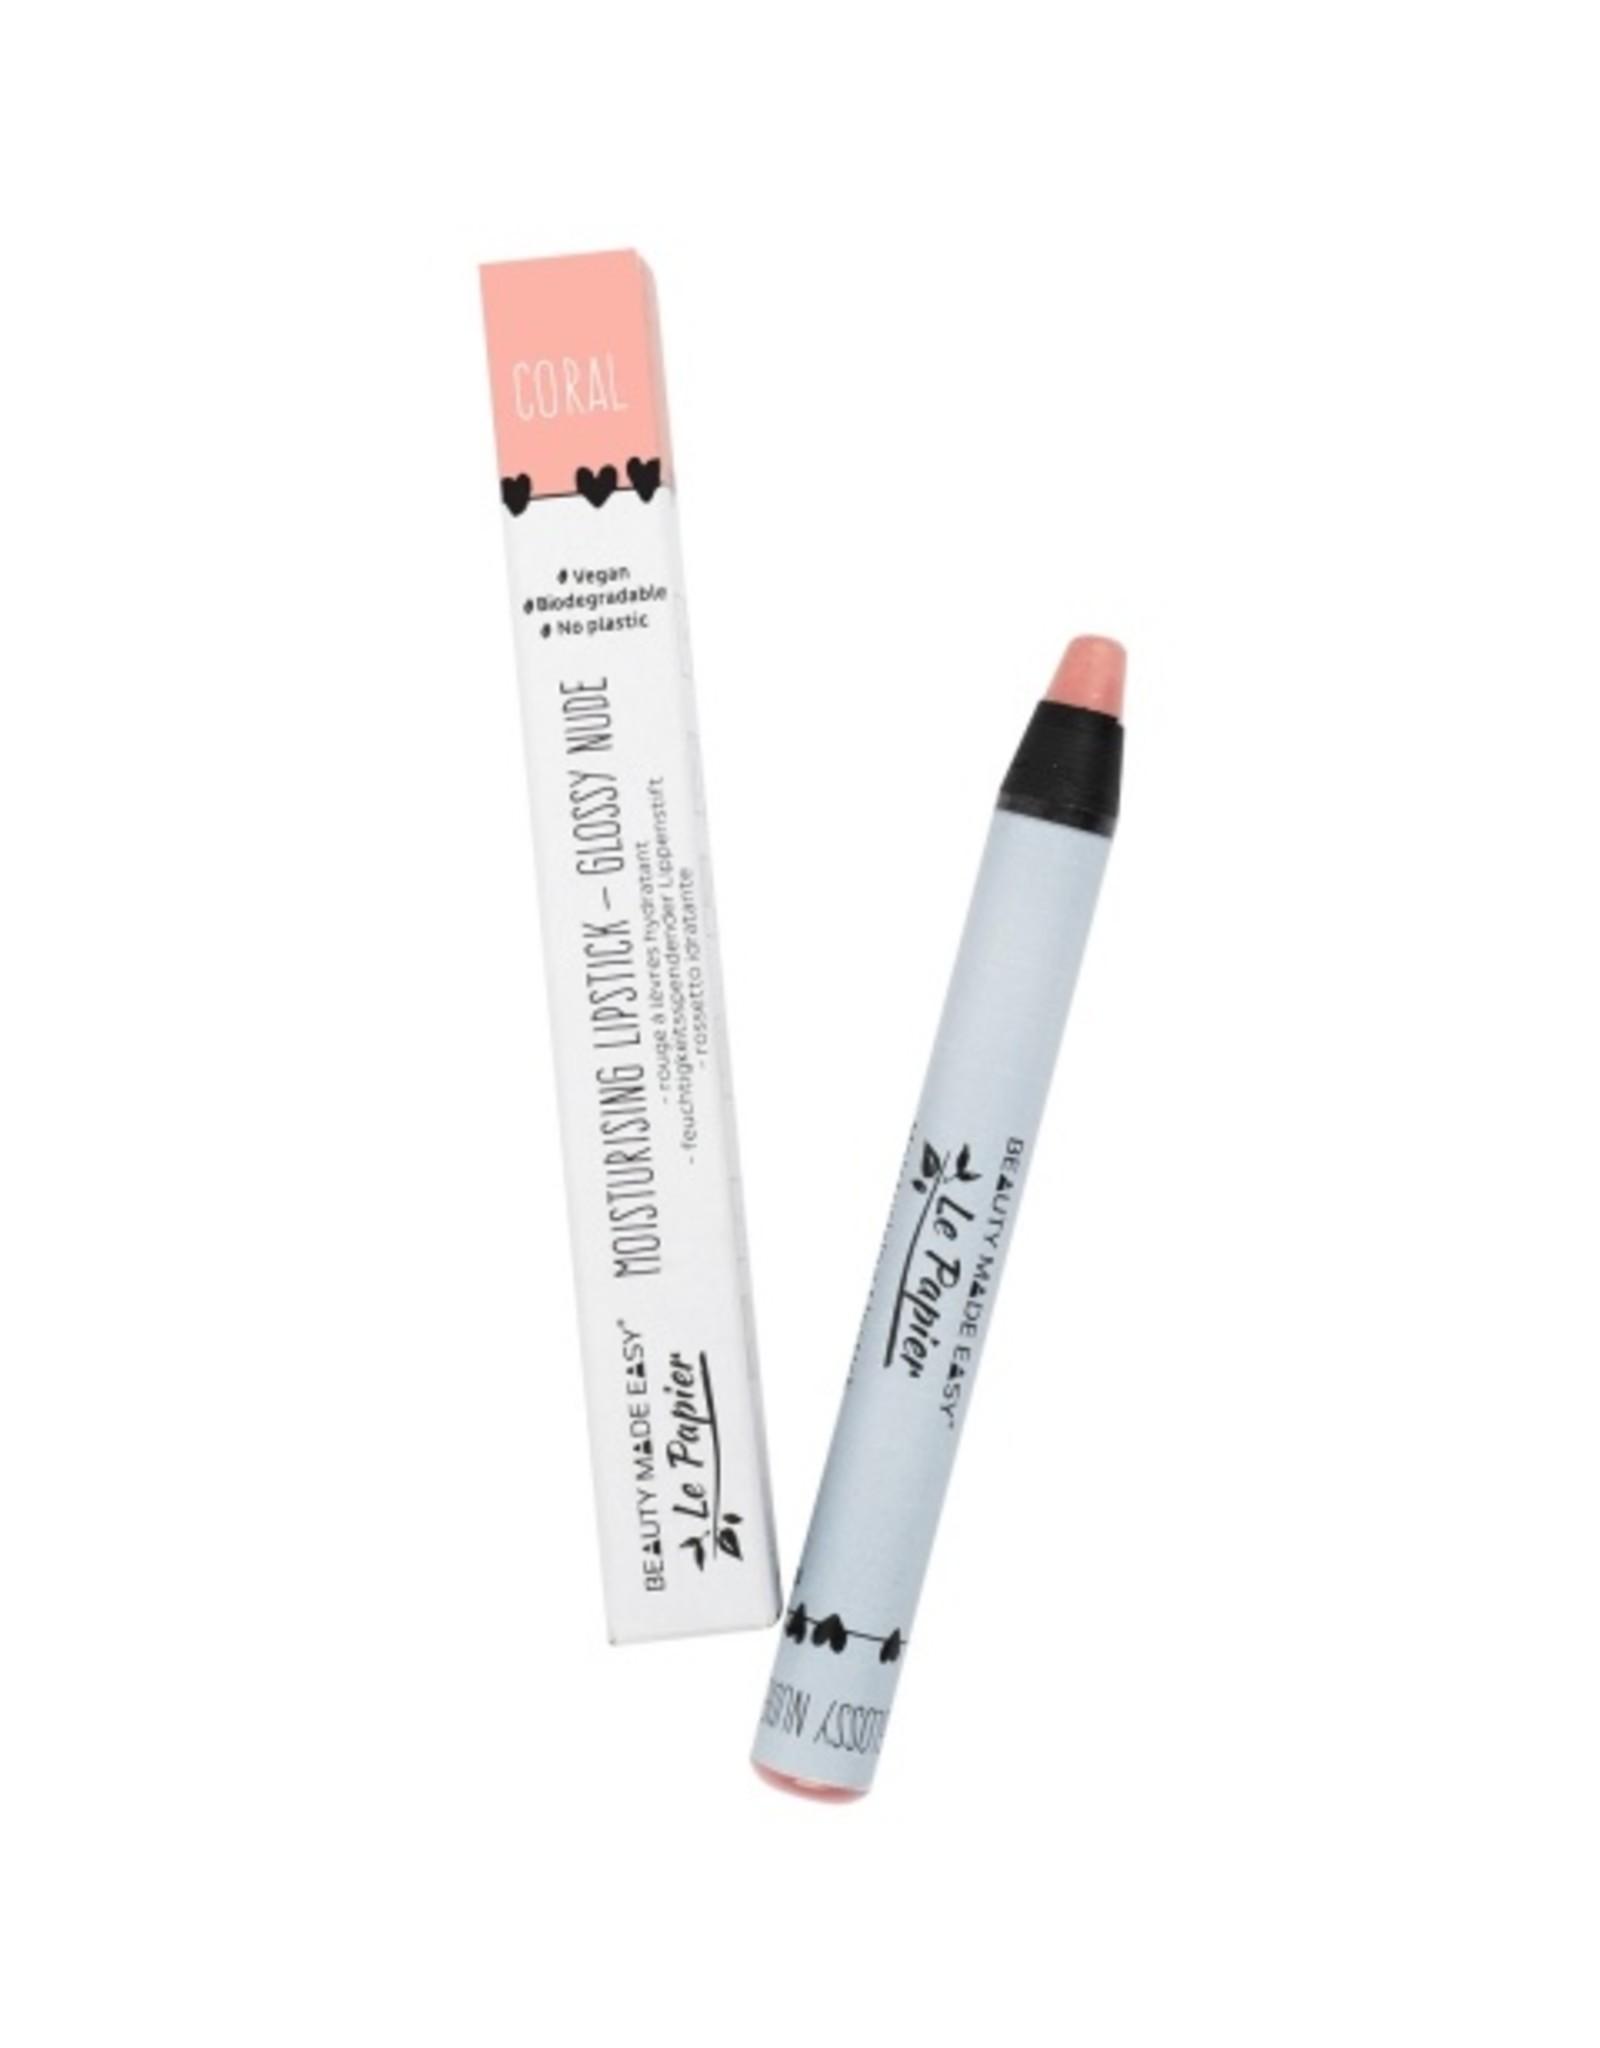 Le papier Moisturizing lipstick - Glossy Nudes - CORAL - 6 g